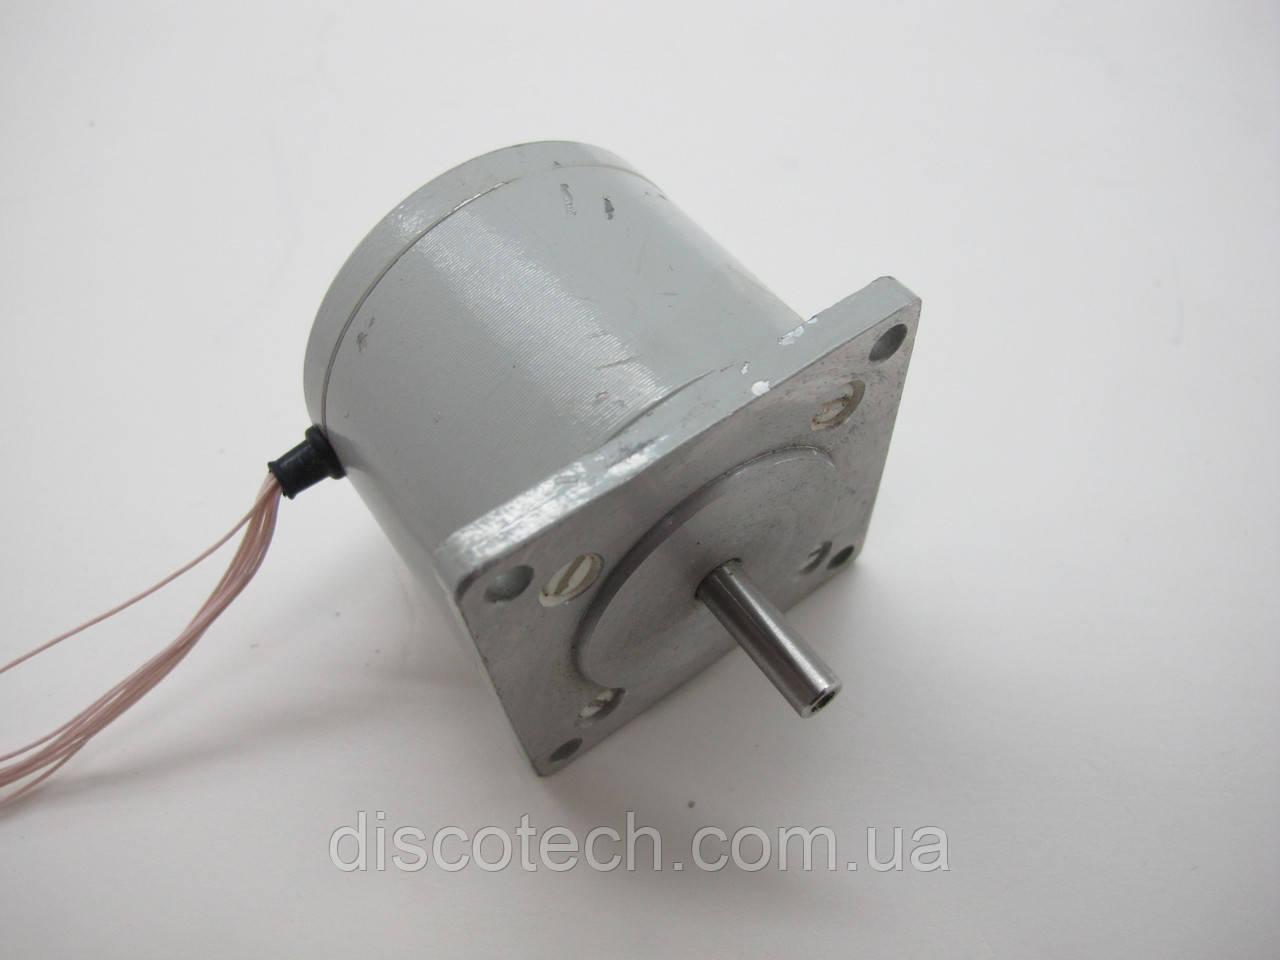 Двигатель шаговый бп 1,8 ф6,0/  2,5 Ом ДШИ 200-2-1